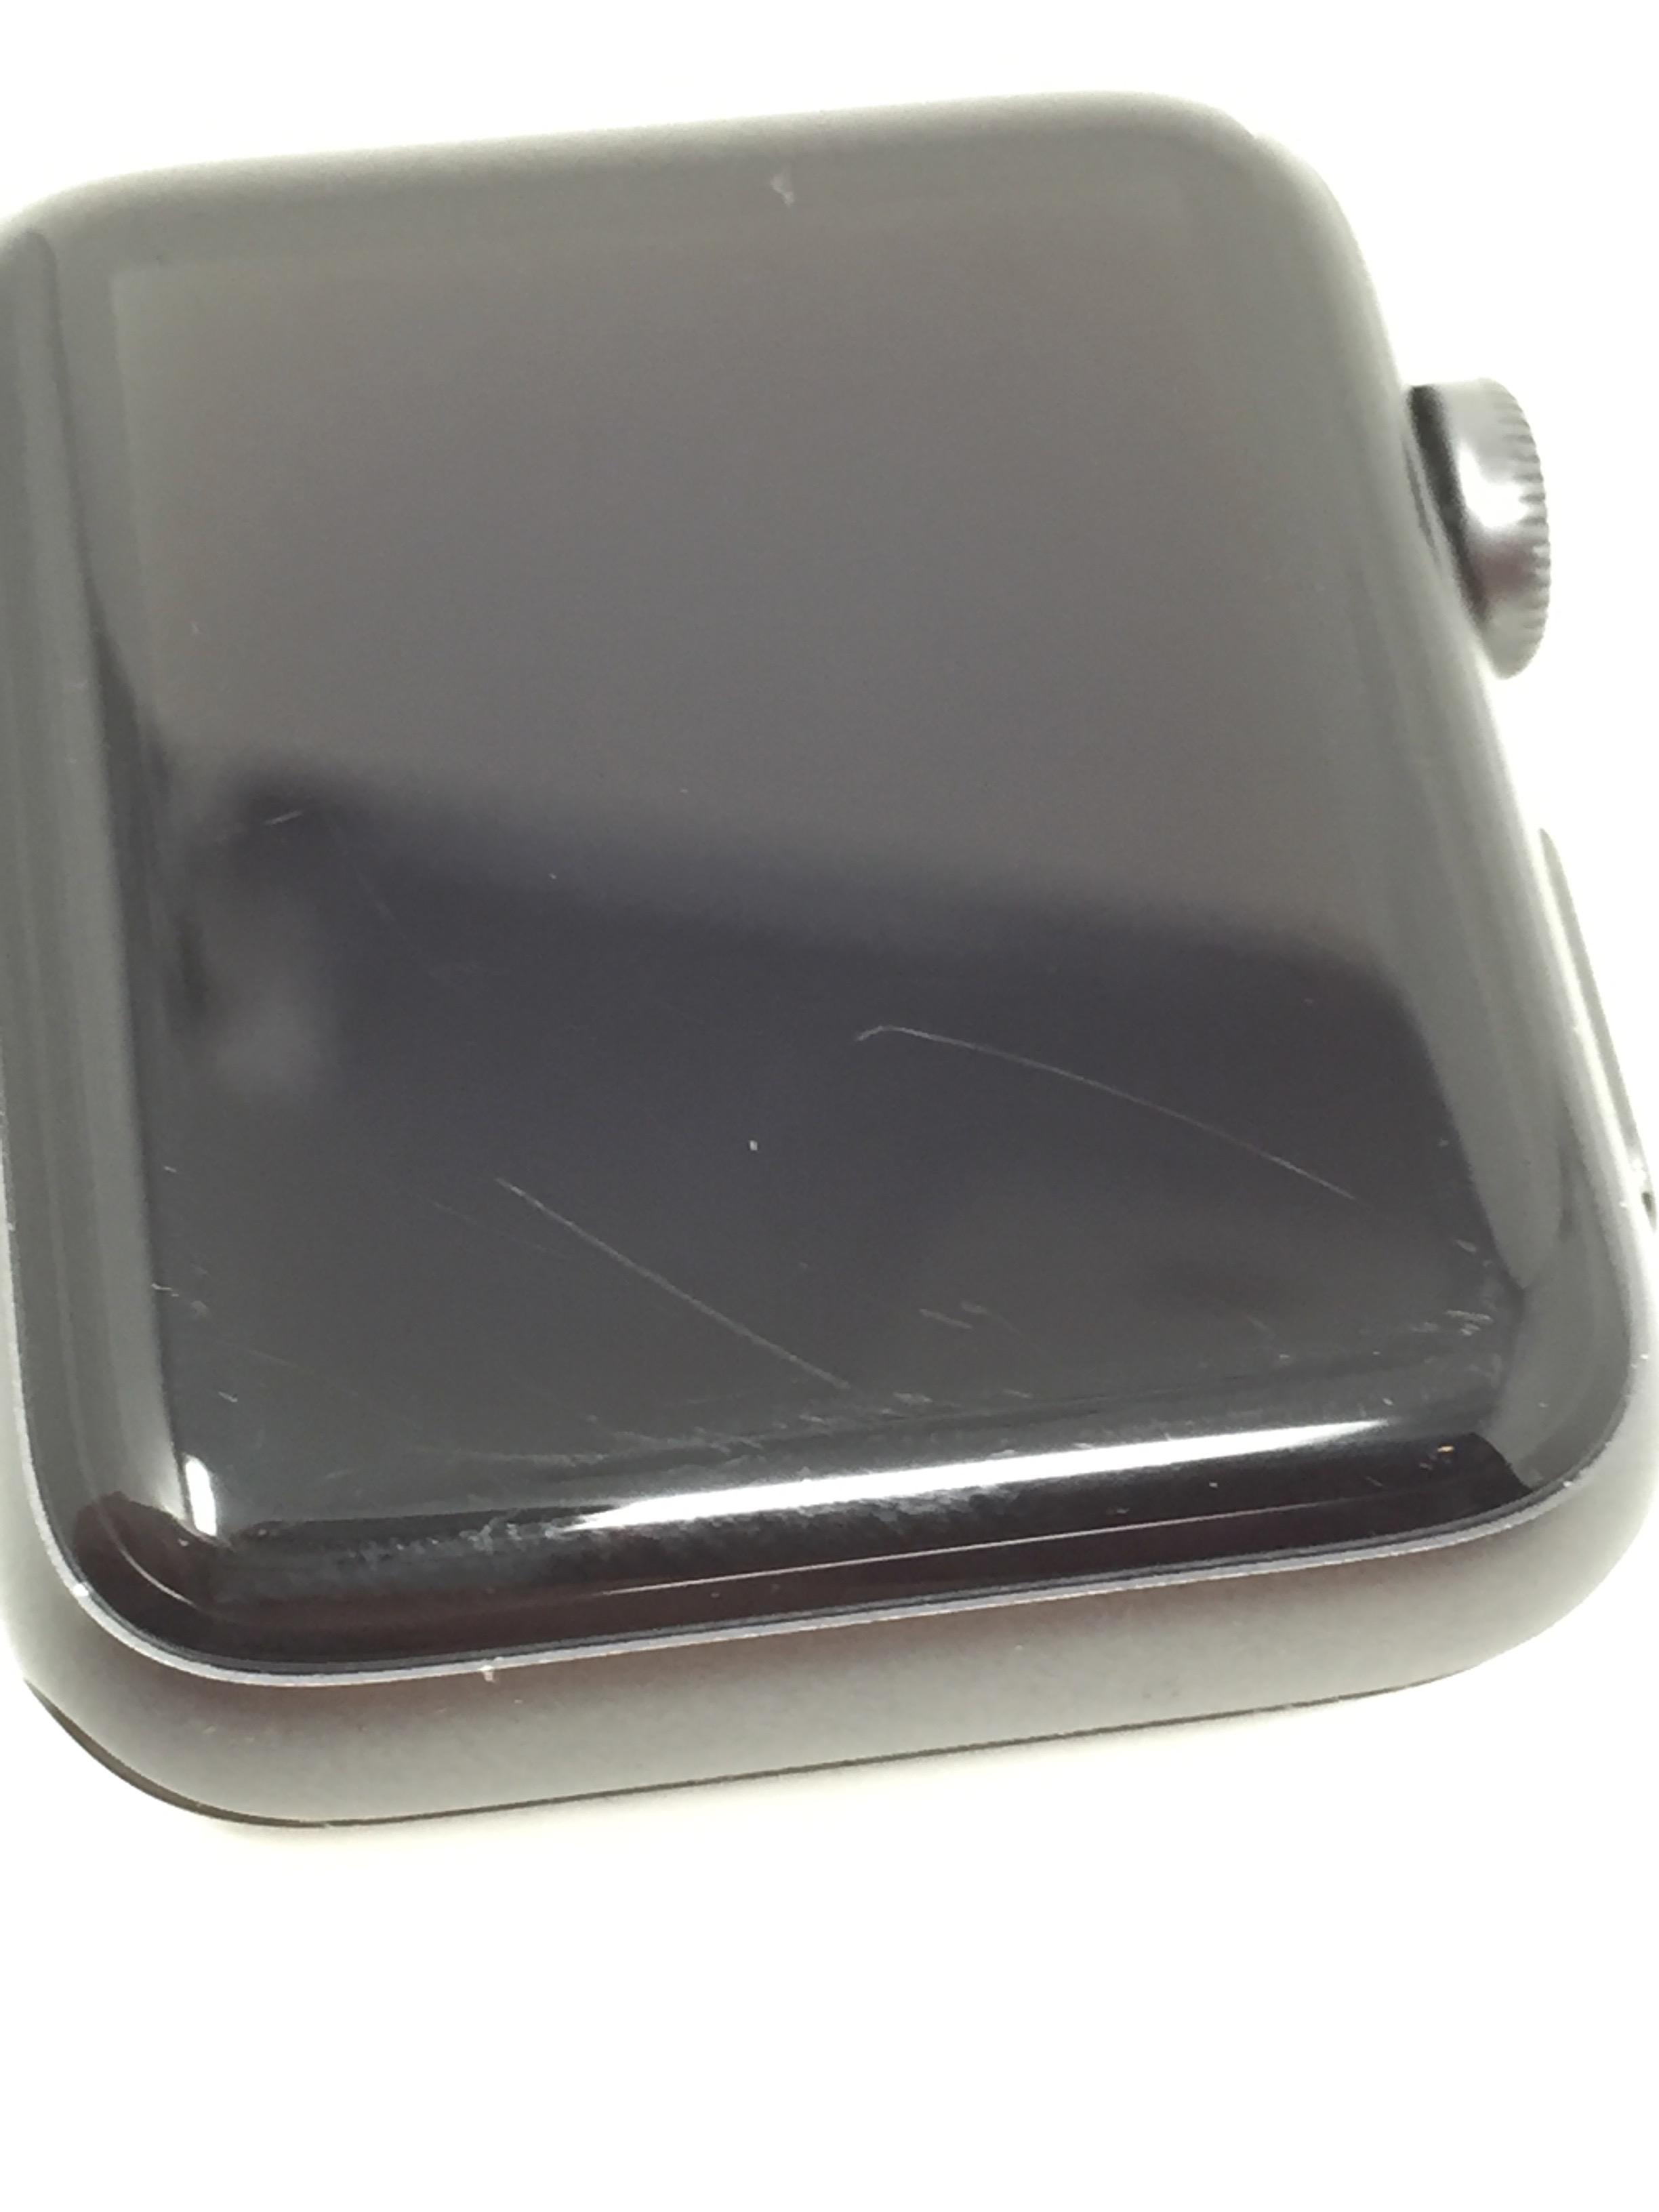 Watch Series 2 Aluminum (42mm), Space Gray, Black Sport Band, imagen 4